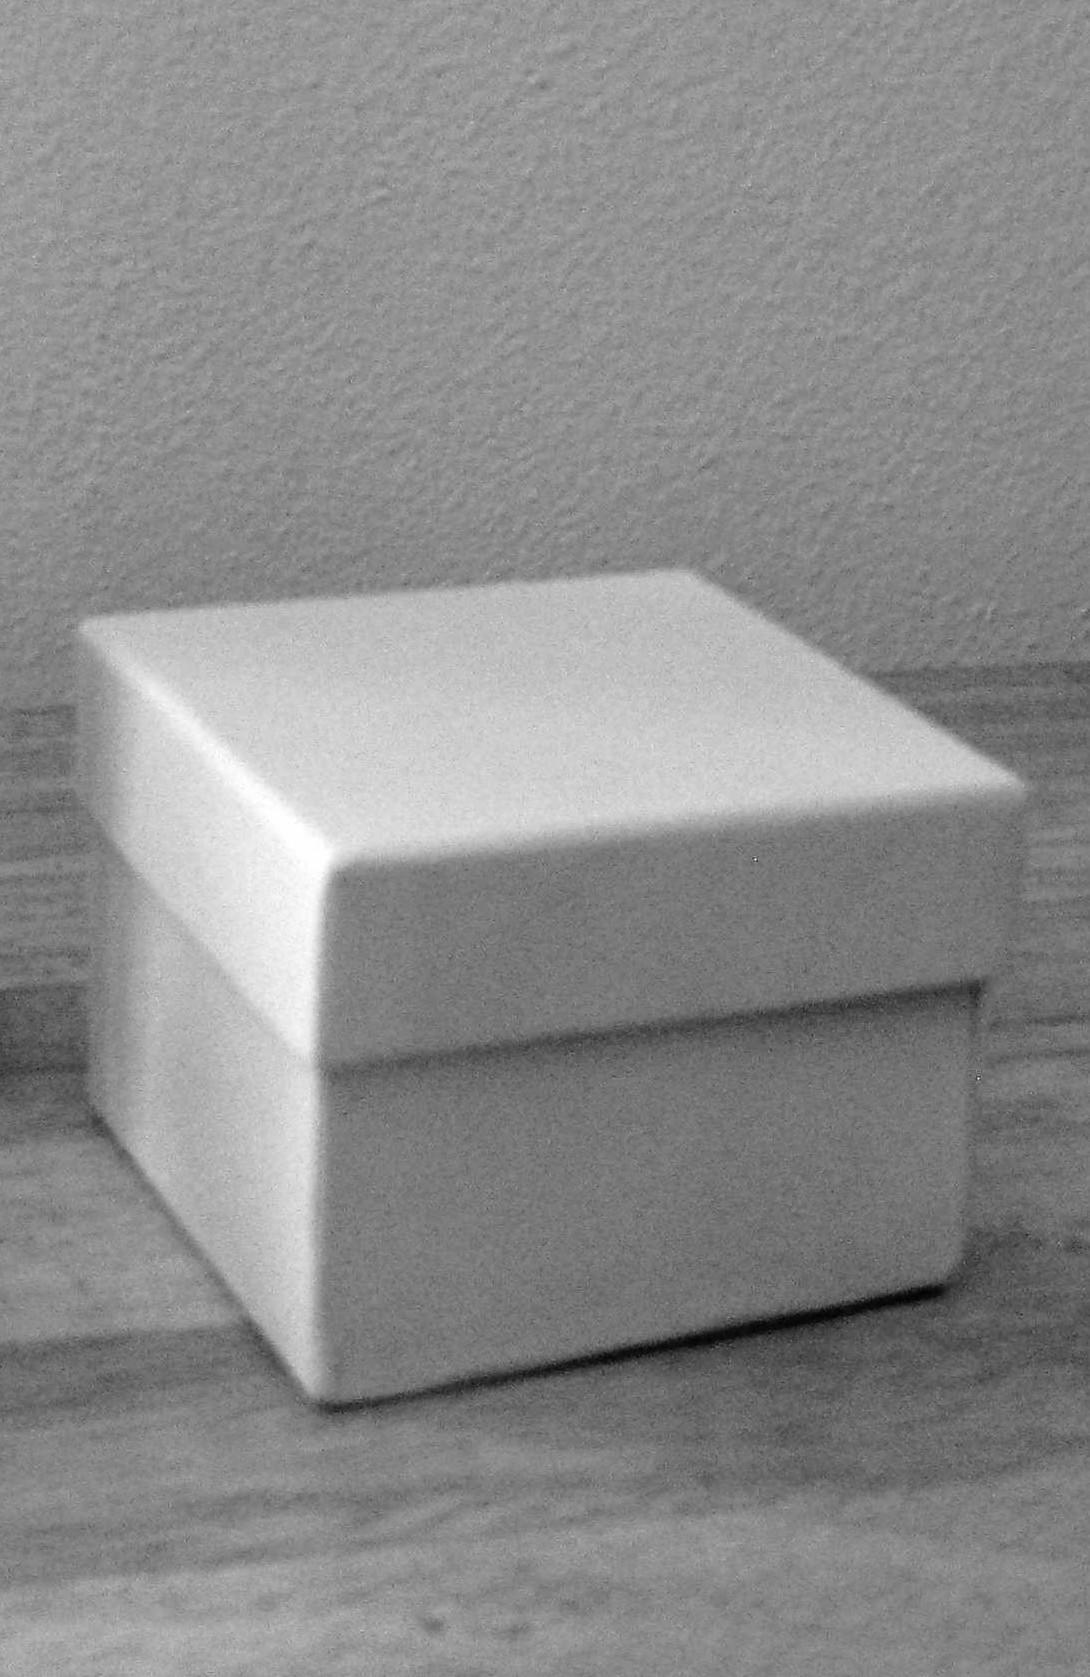 Free forum : I draw - Portal Cubeg